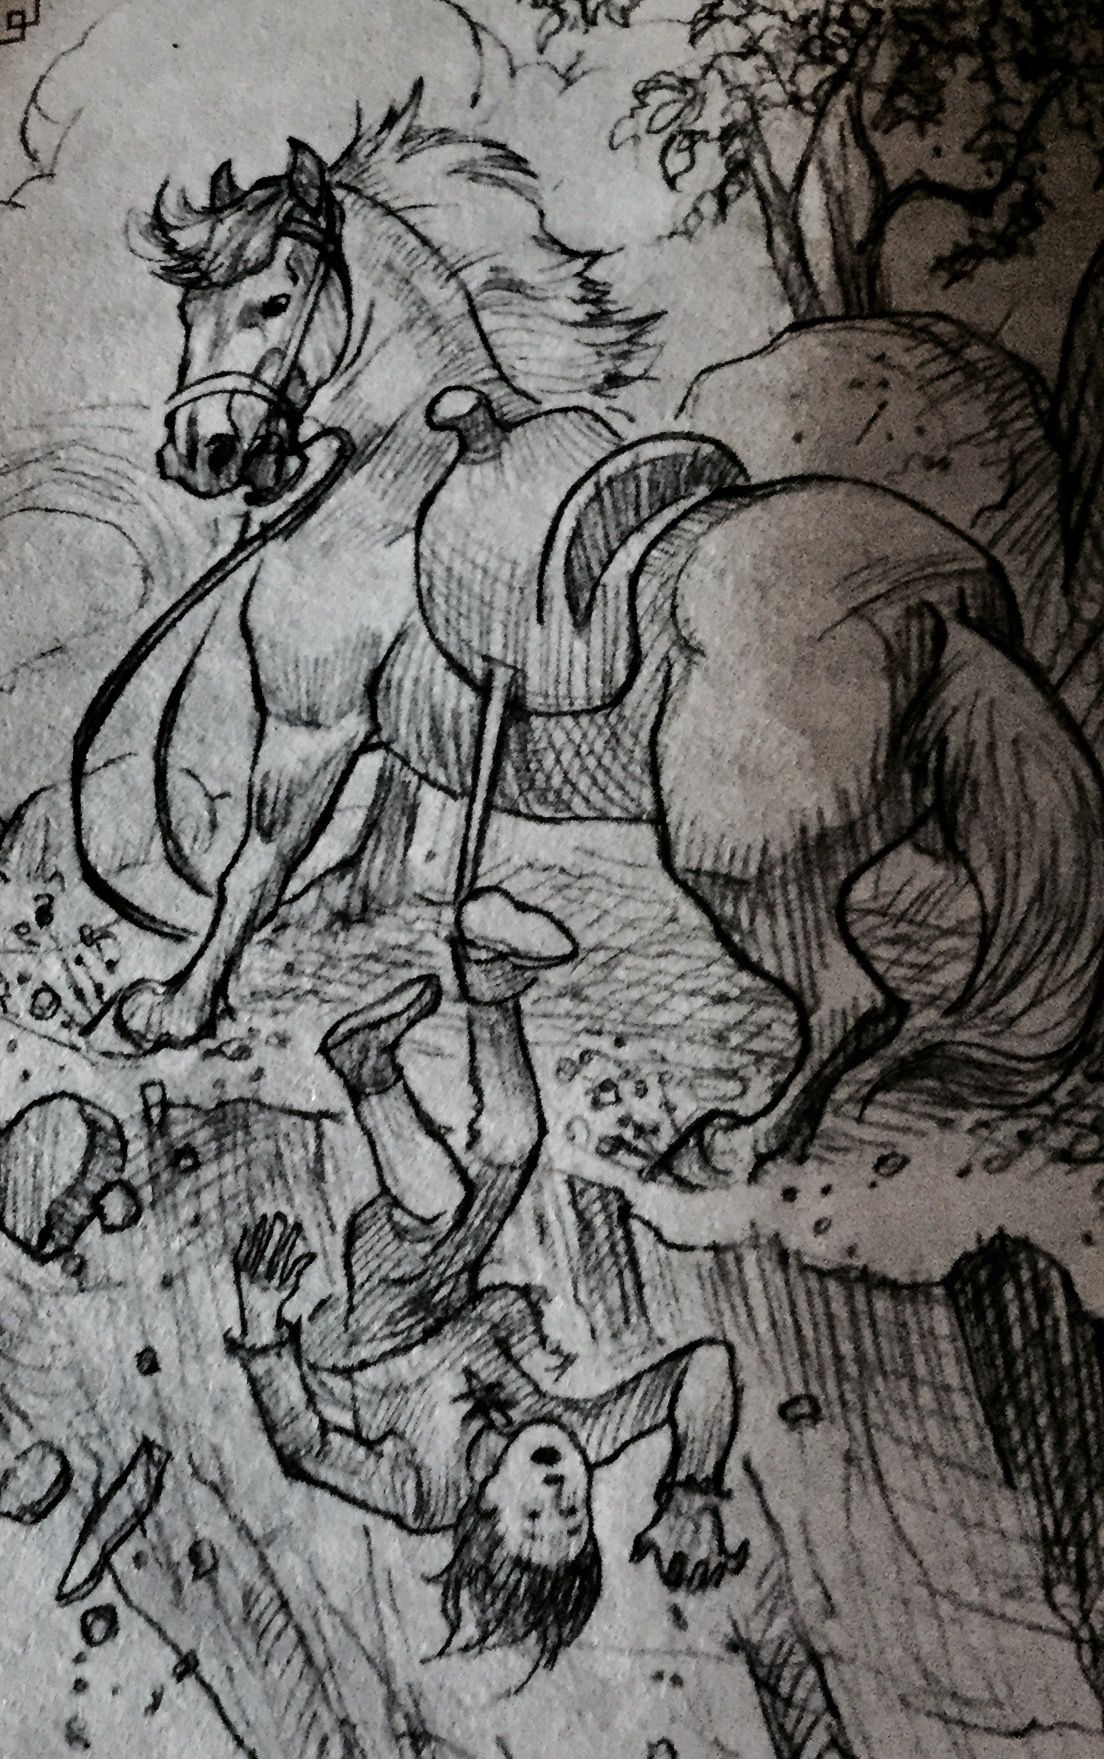 pinfaithlove on beast quest  historical figures